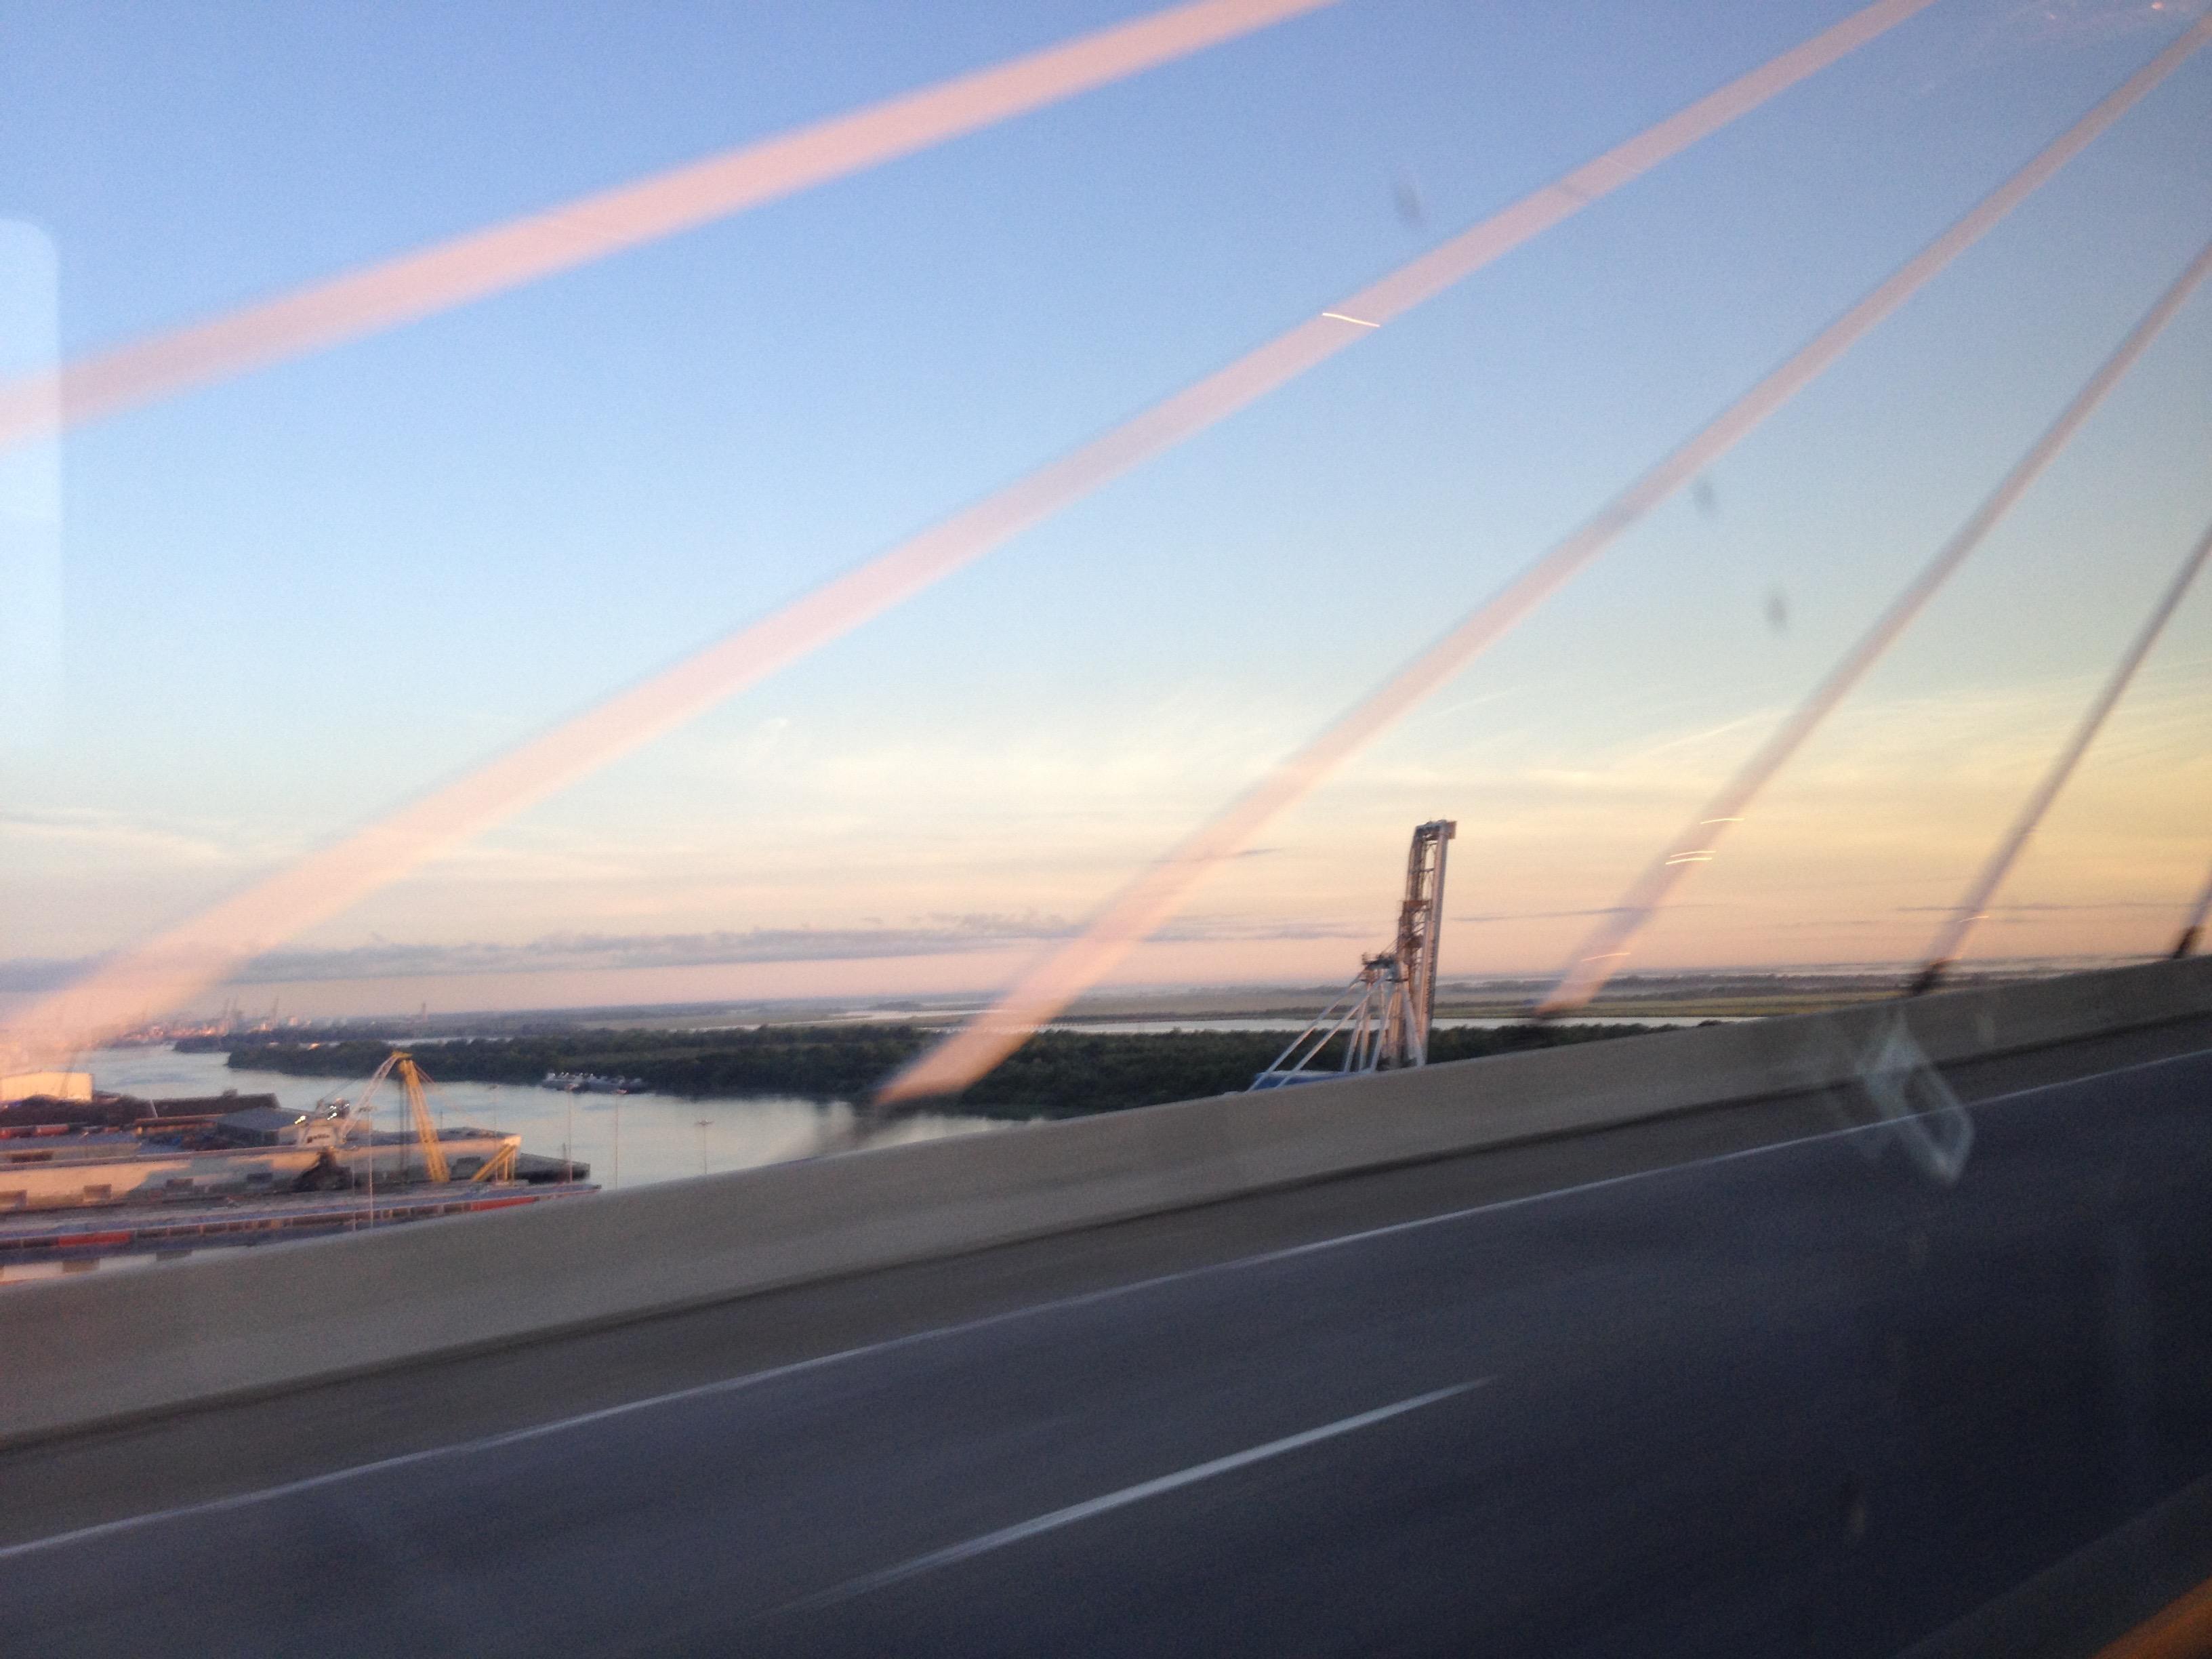 Arrivederci Atlanta